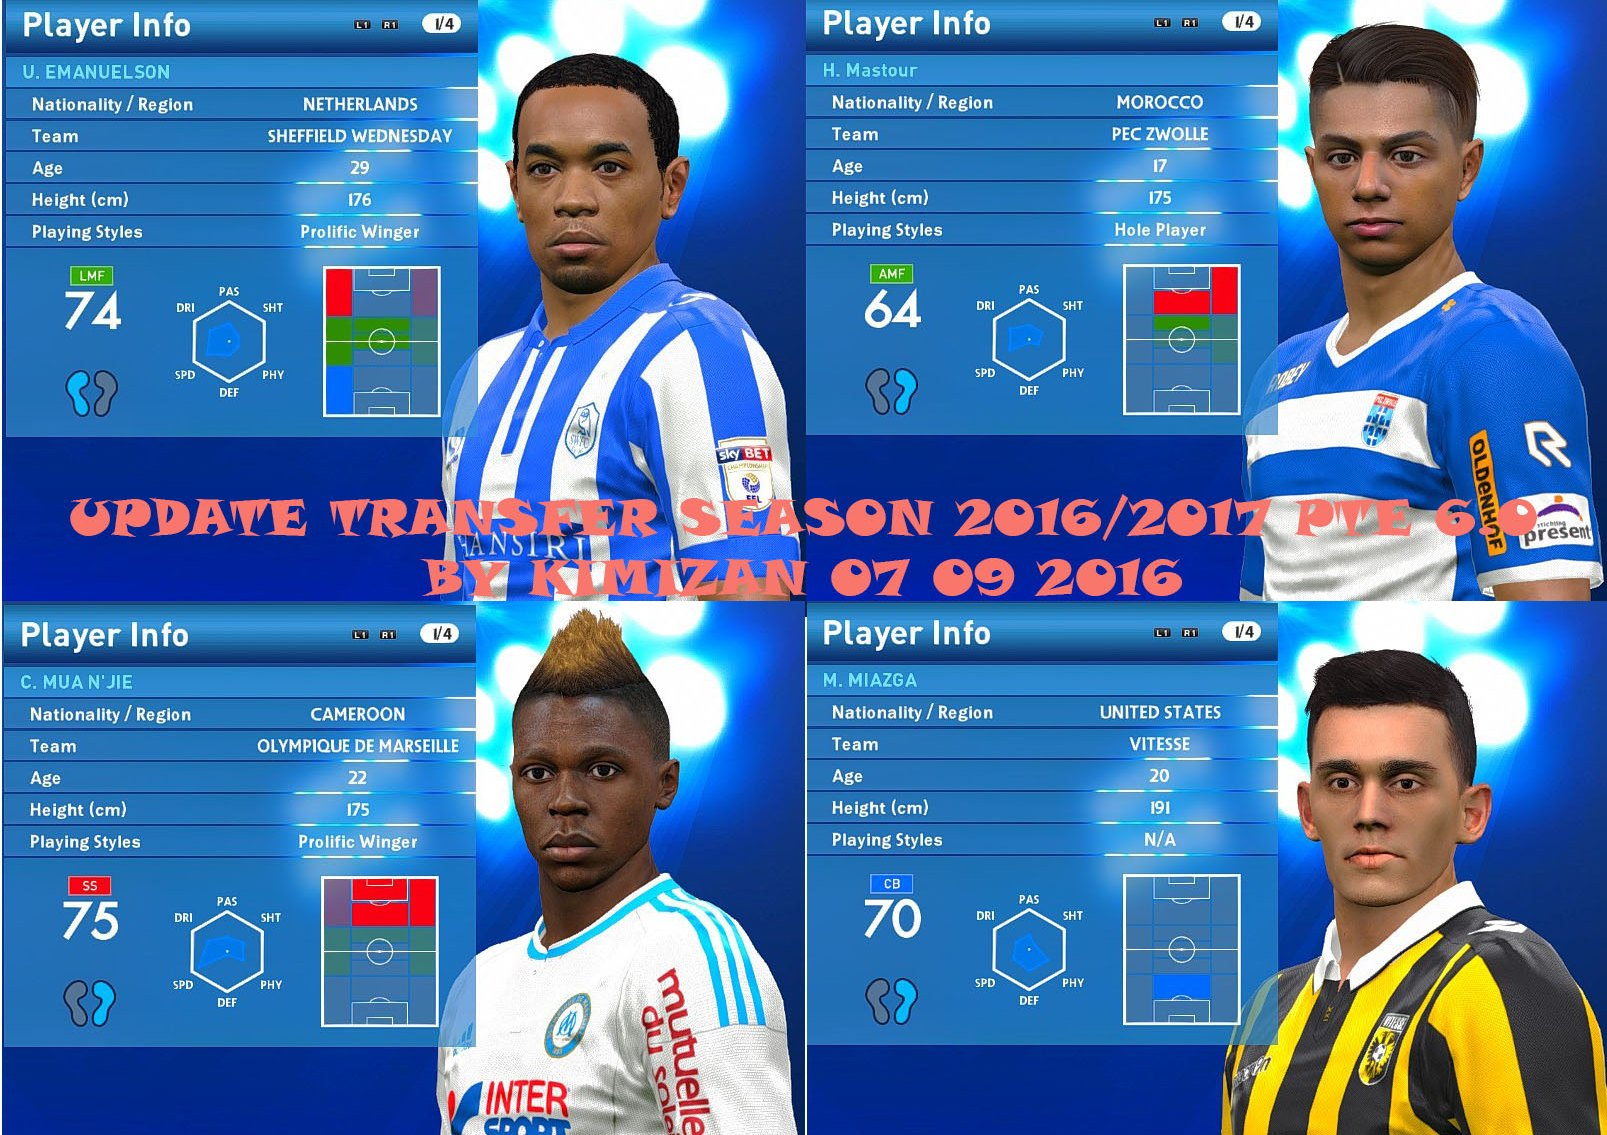 Update Transfer Season 2016-17 PES 2016 PTE Patch 6 0